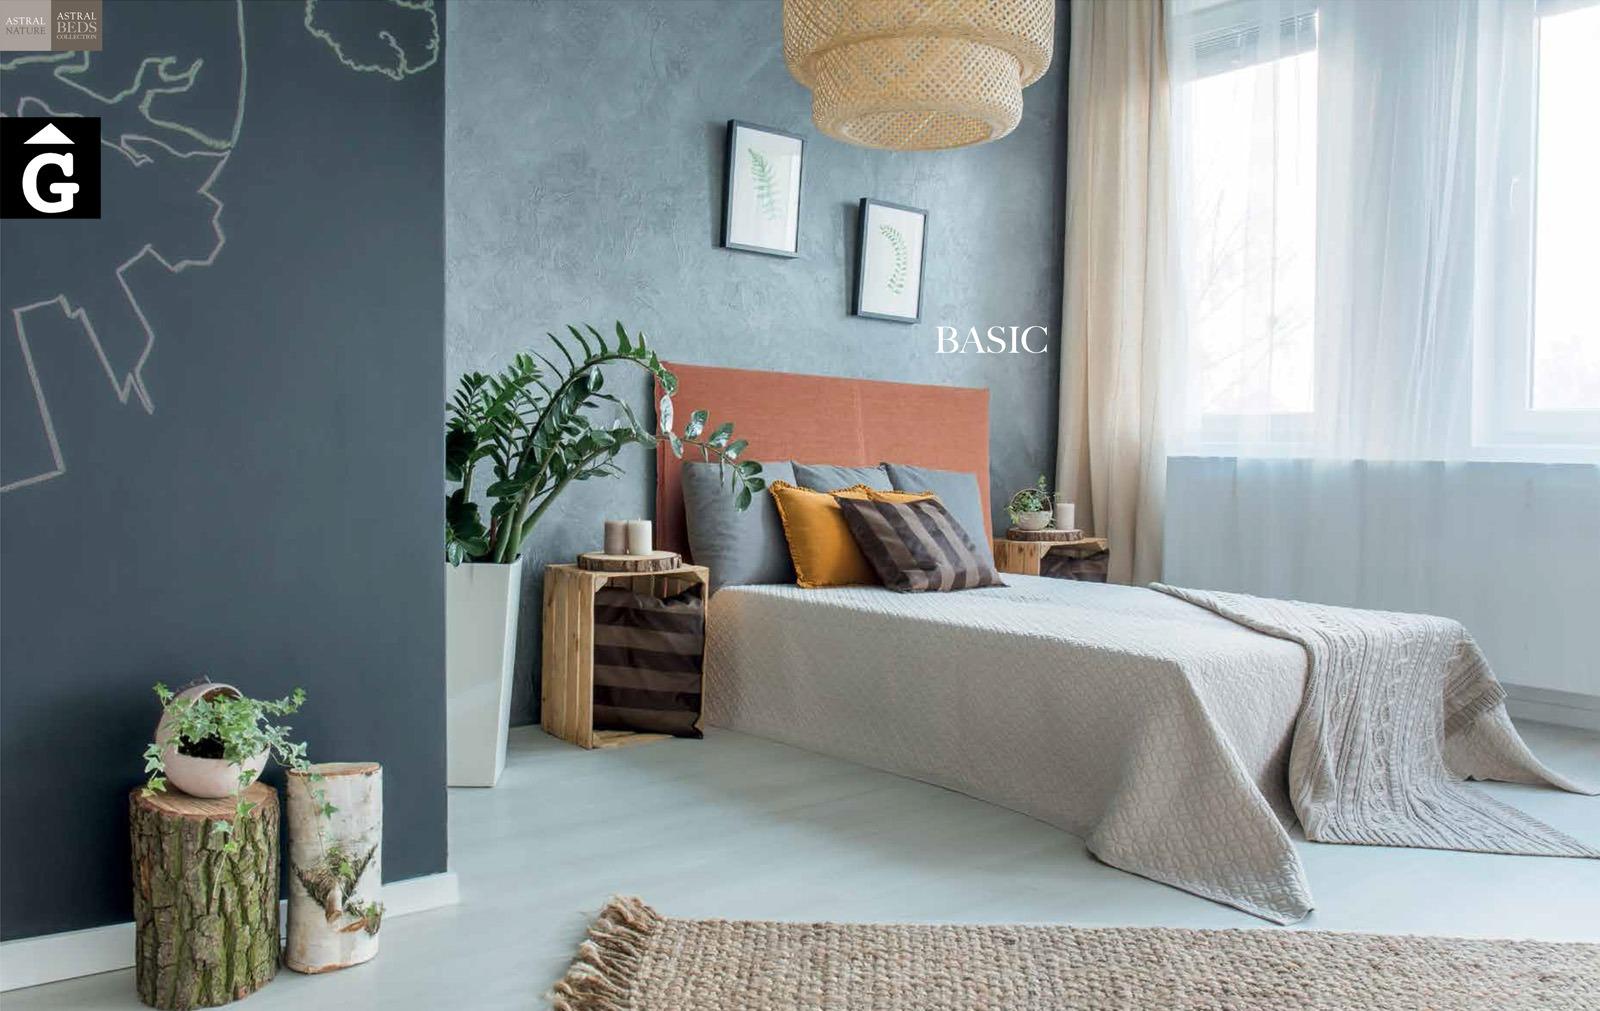 Basic llit entapissat Beds Astral Nature descans qualitat natural i salut junts per mobles Gifreu